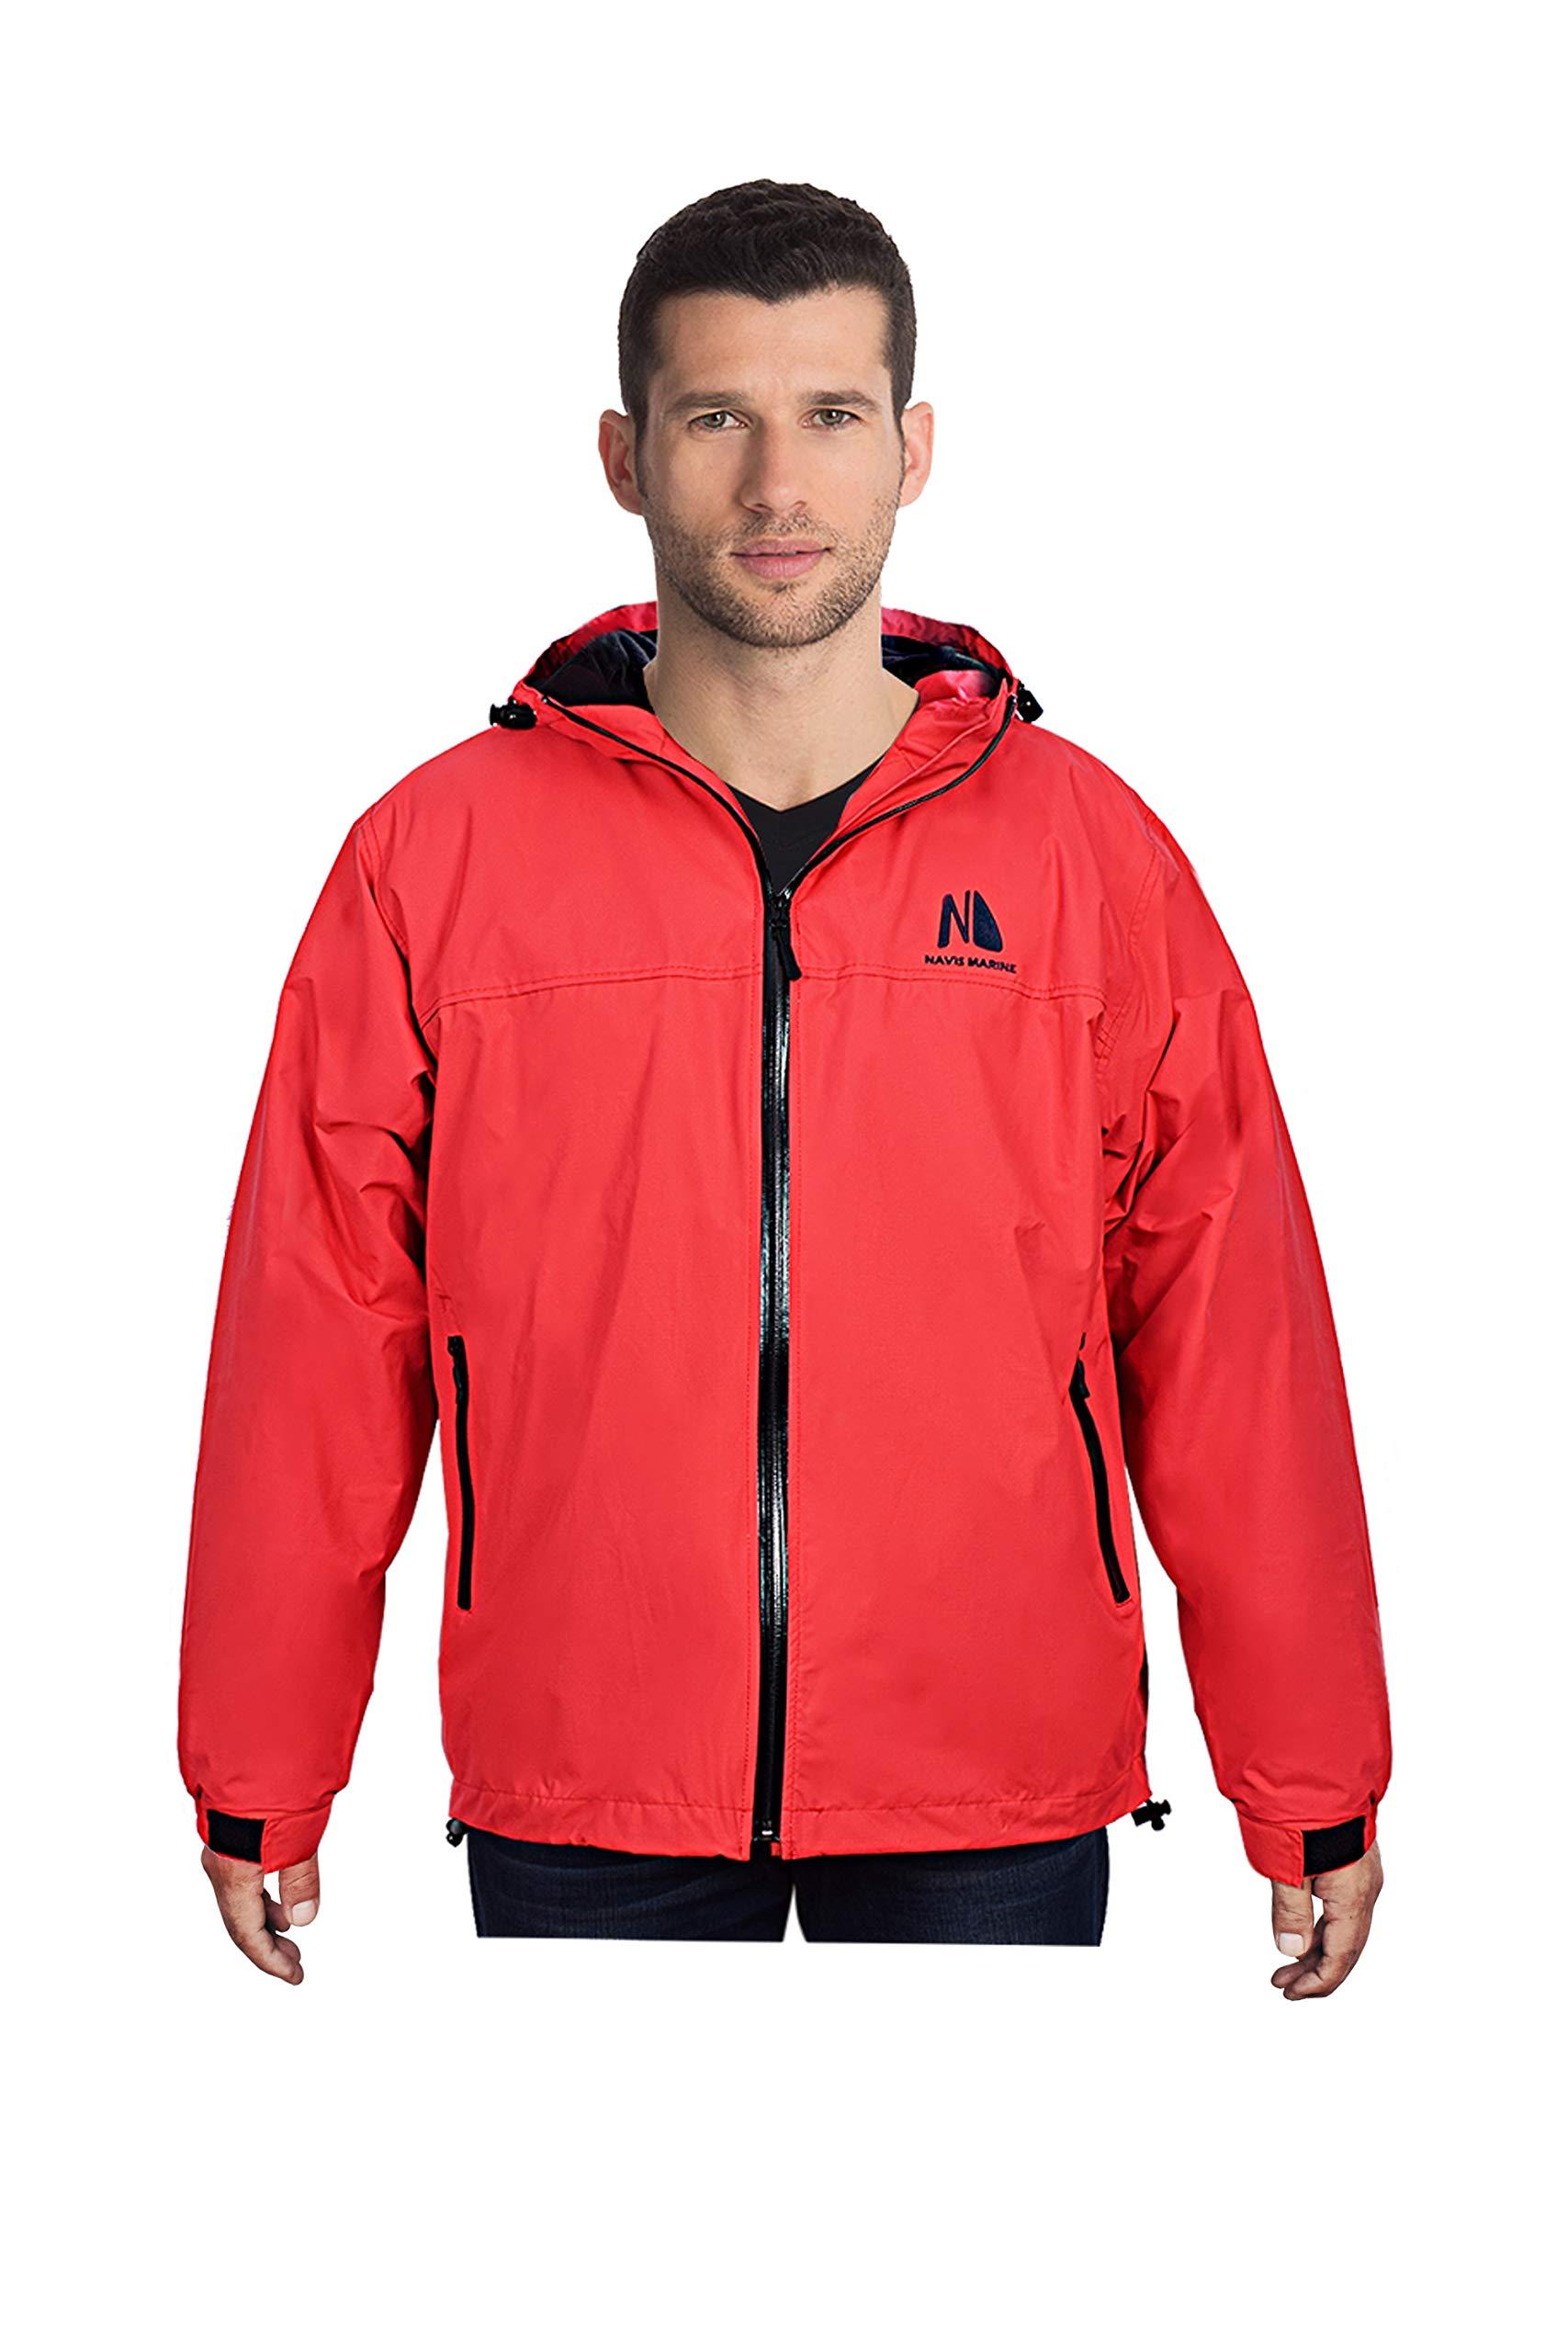 Waterproof Insulated Jacket for Men Women Sailing Fishing Rain Coat Crew Midlayer Fleece Lined Breathable Windproof